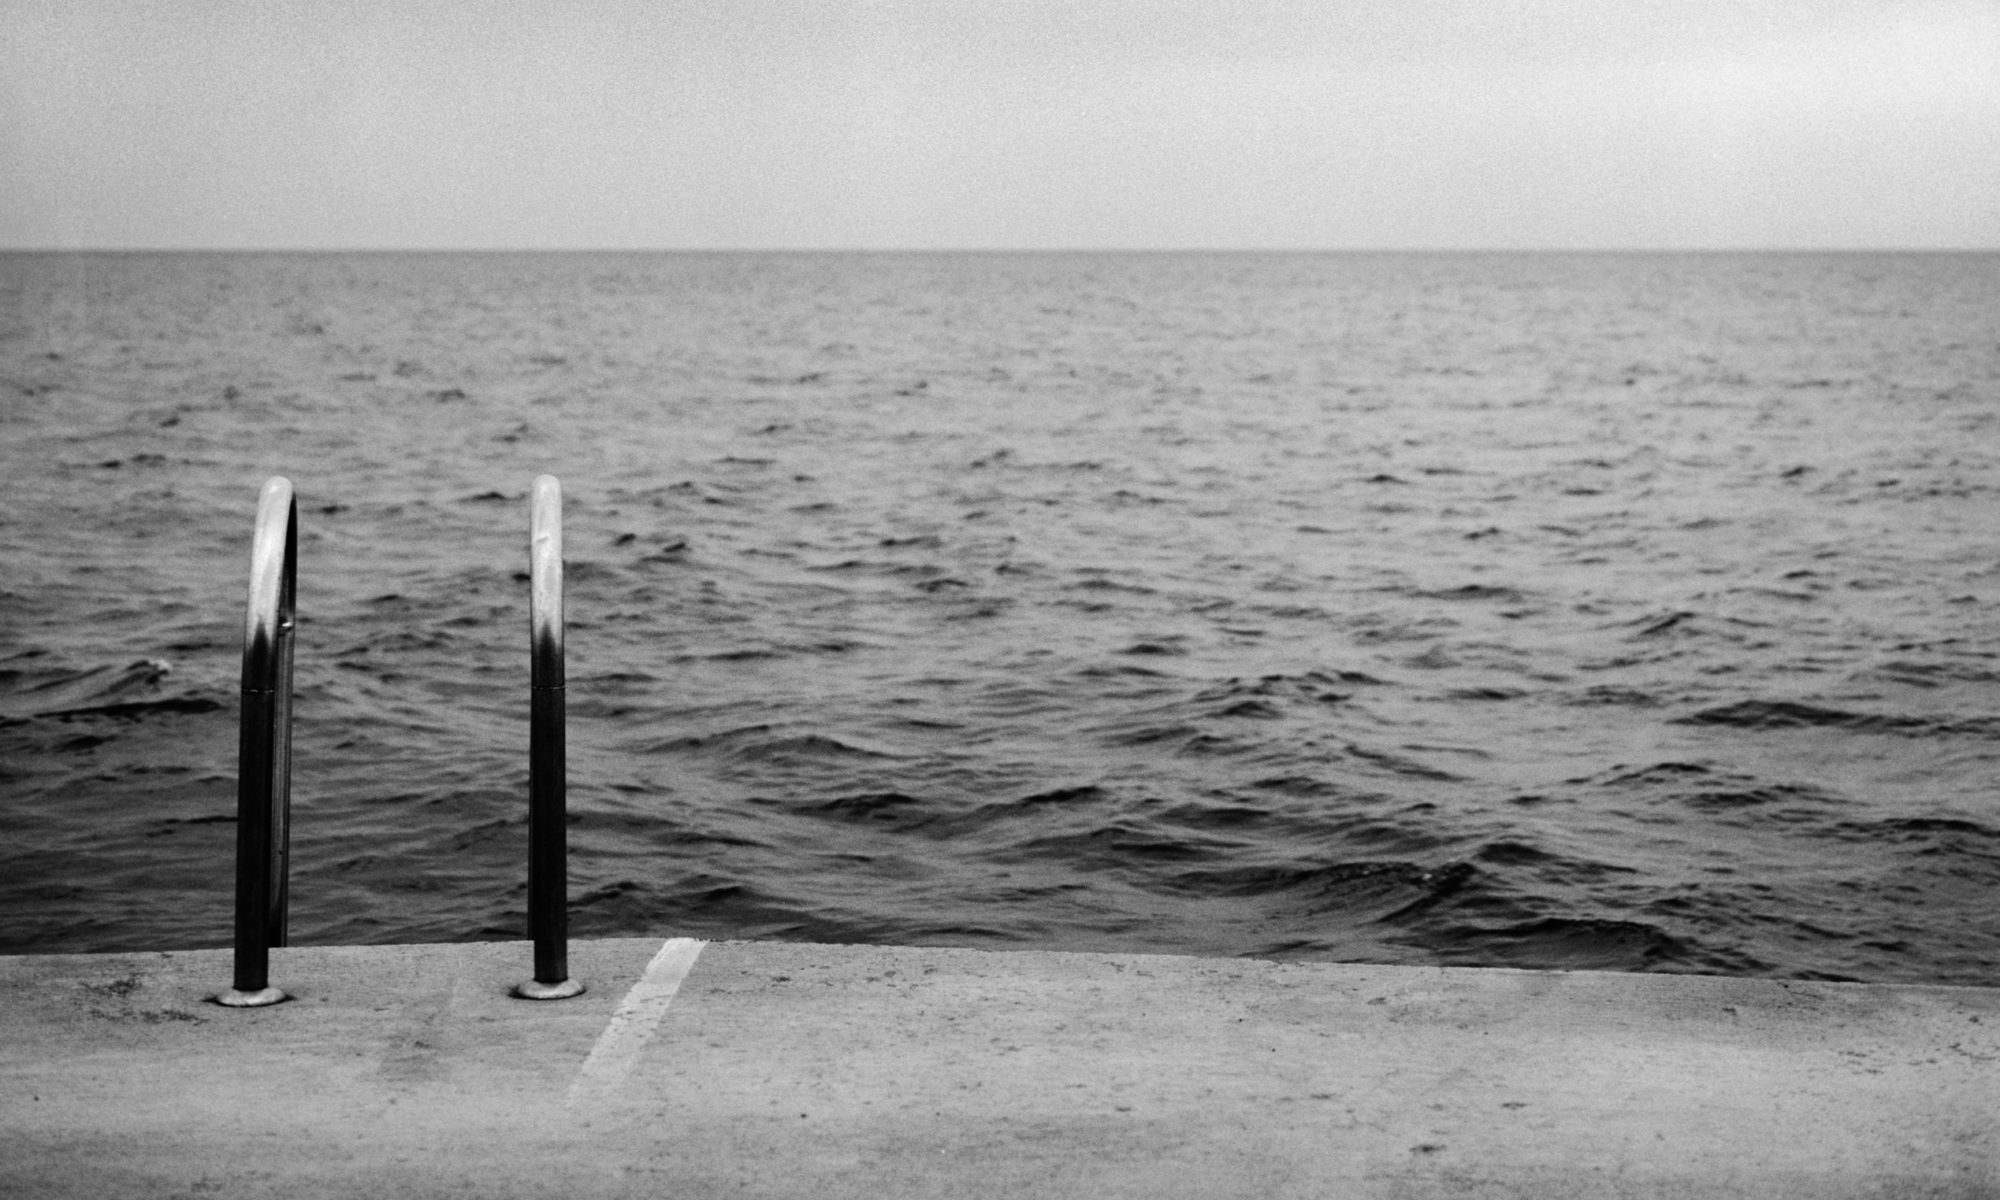 Ocean18